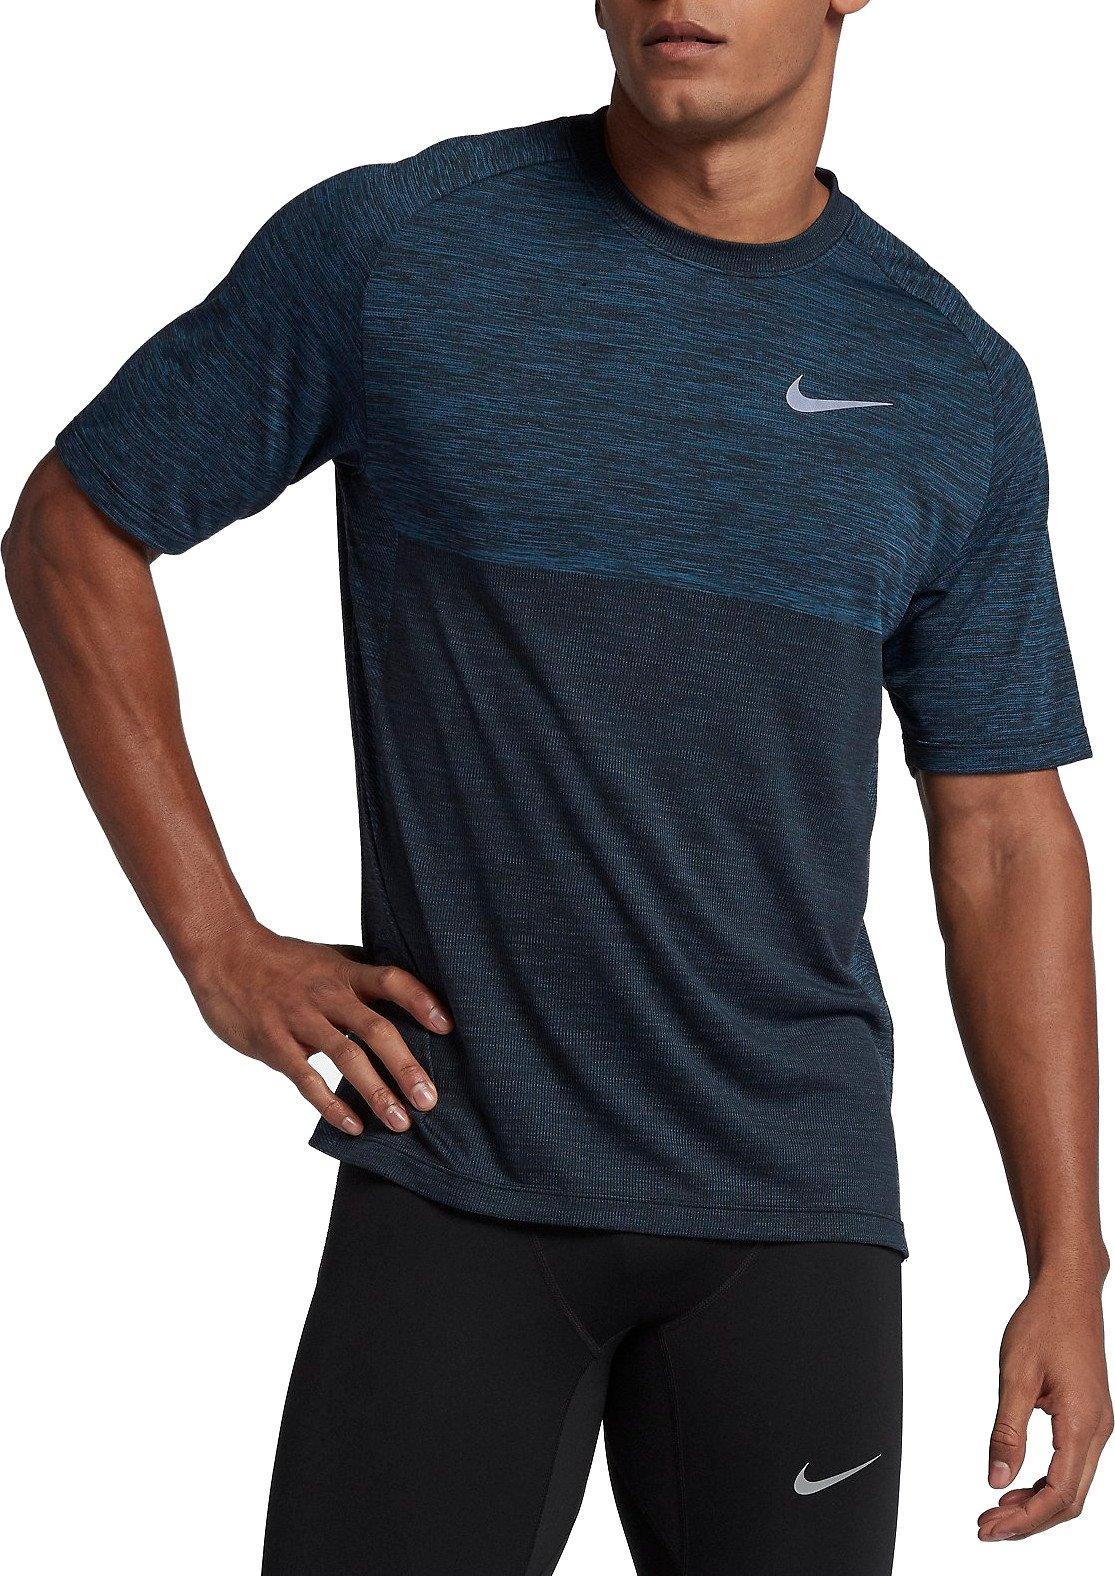 T-shirt Nike M NK DRY MEDALIST TOP SS